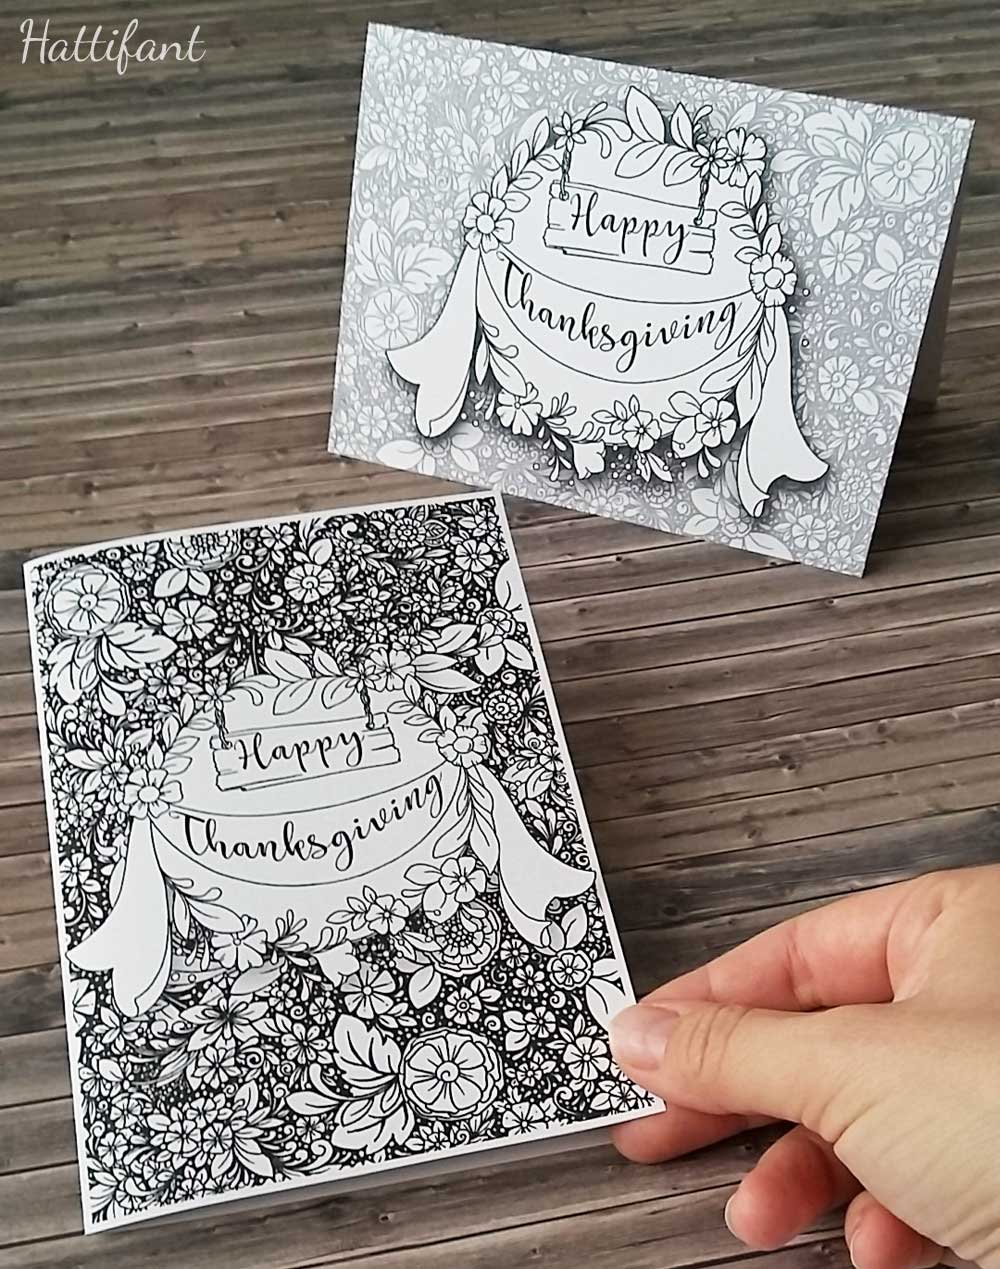 Hattifant's Thanksgiving Table Decoration Flower Doodle Cat Printables Cards